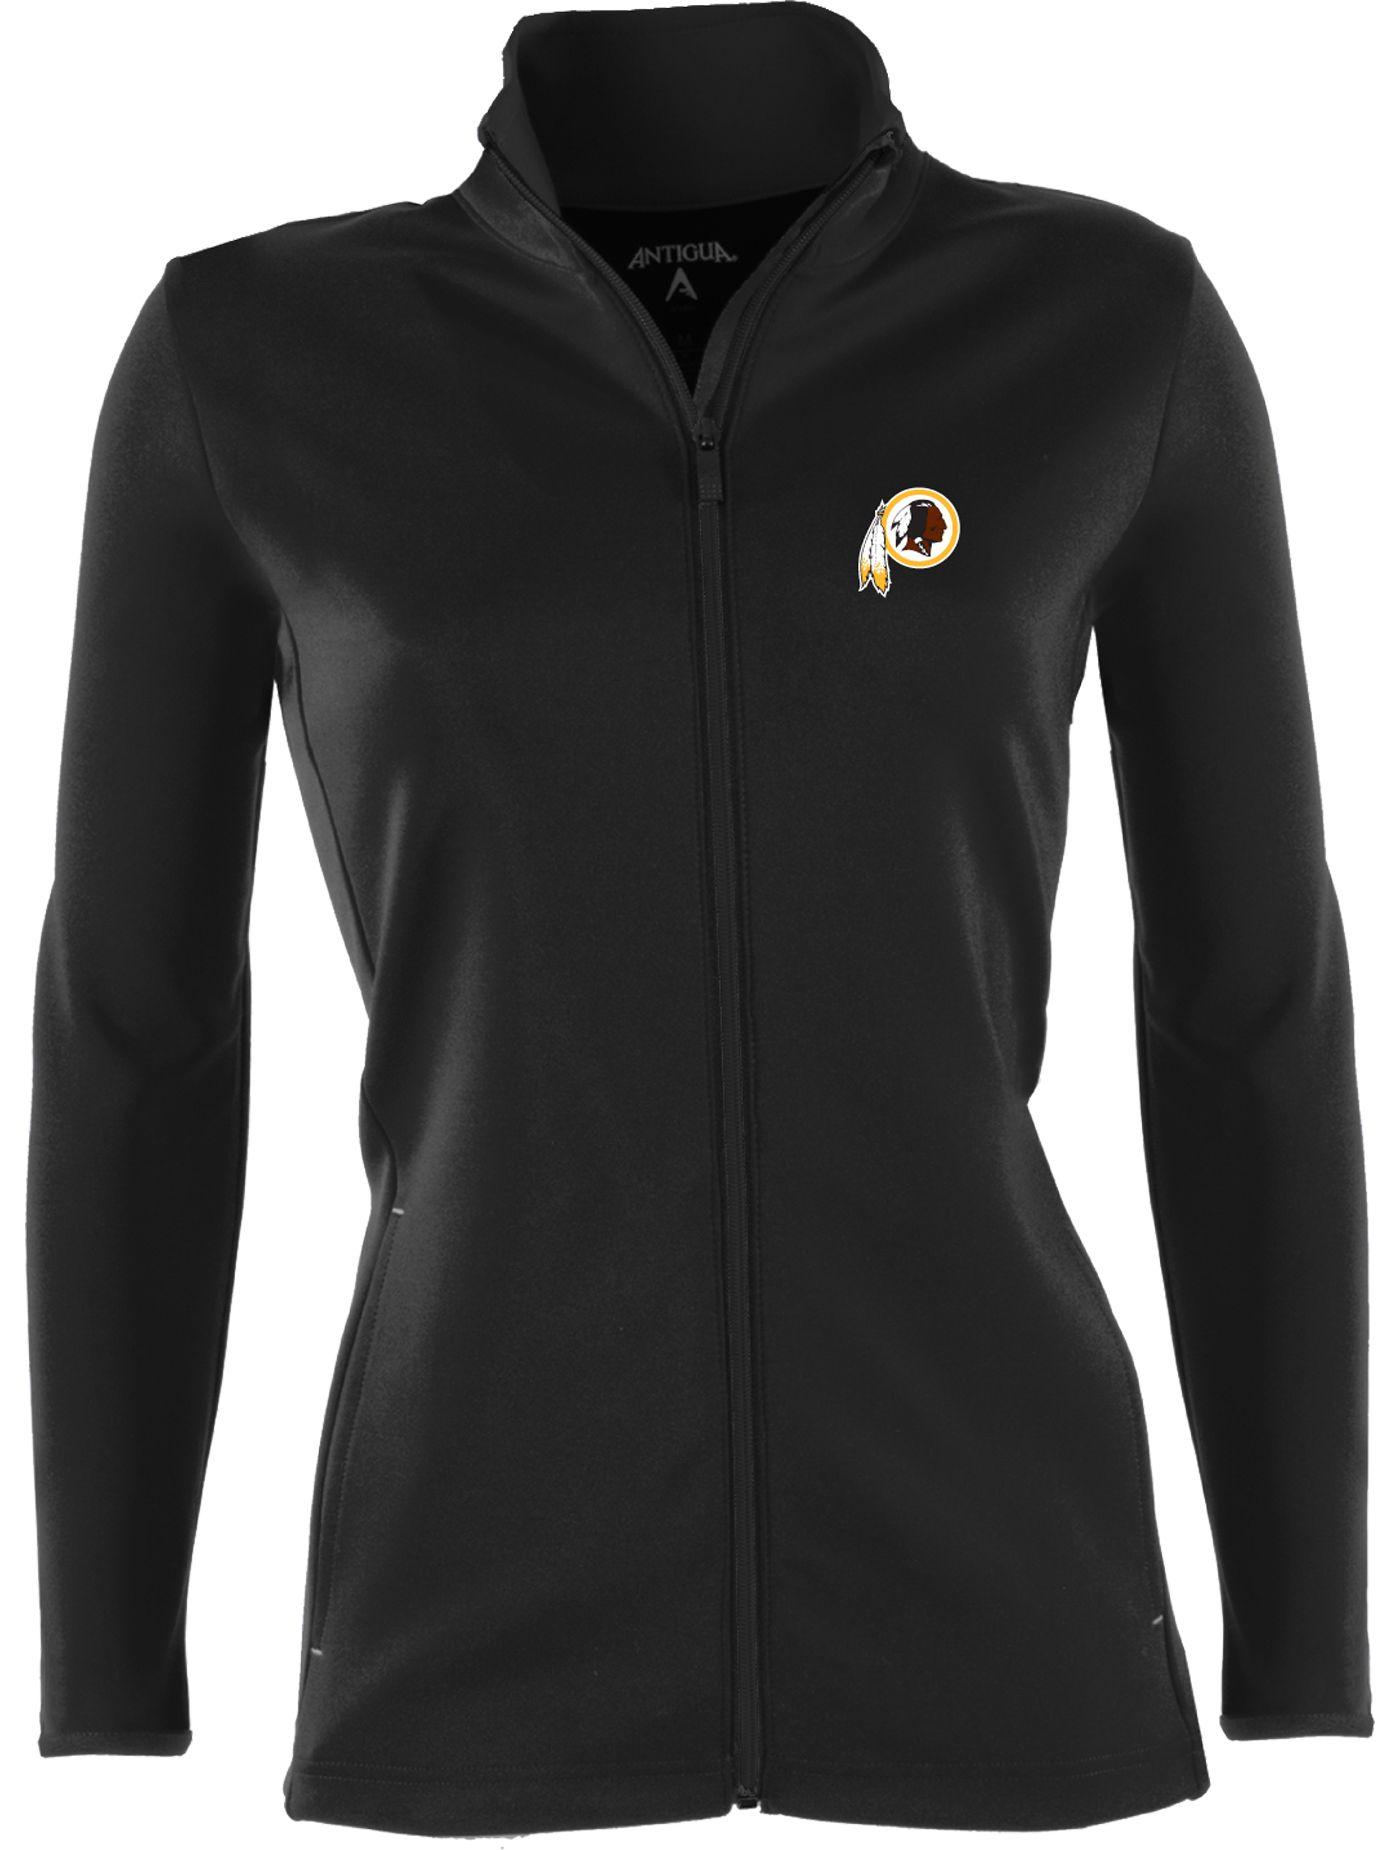 Antigua Women's Washington Redskins Leader Full-Zip Black Jacket